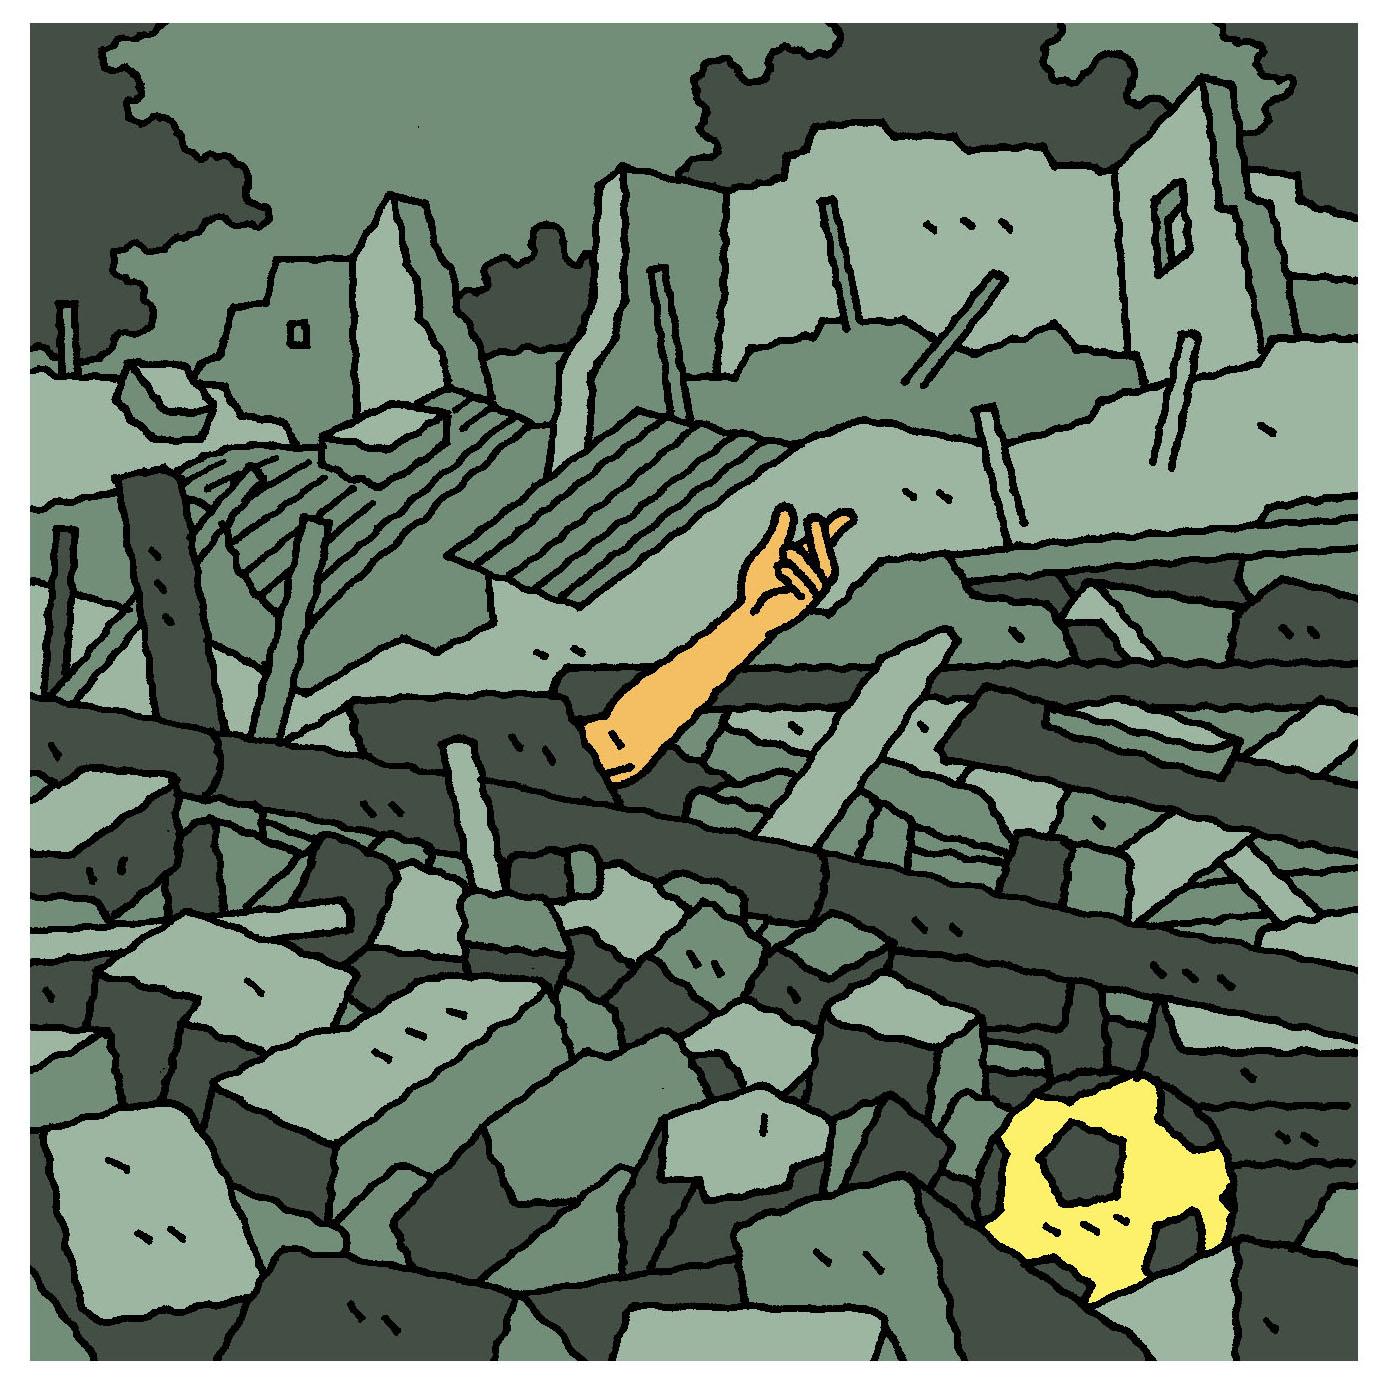 Drones-Comic-cuadro15 (1)